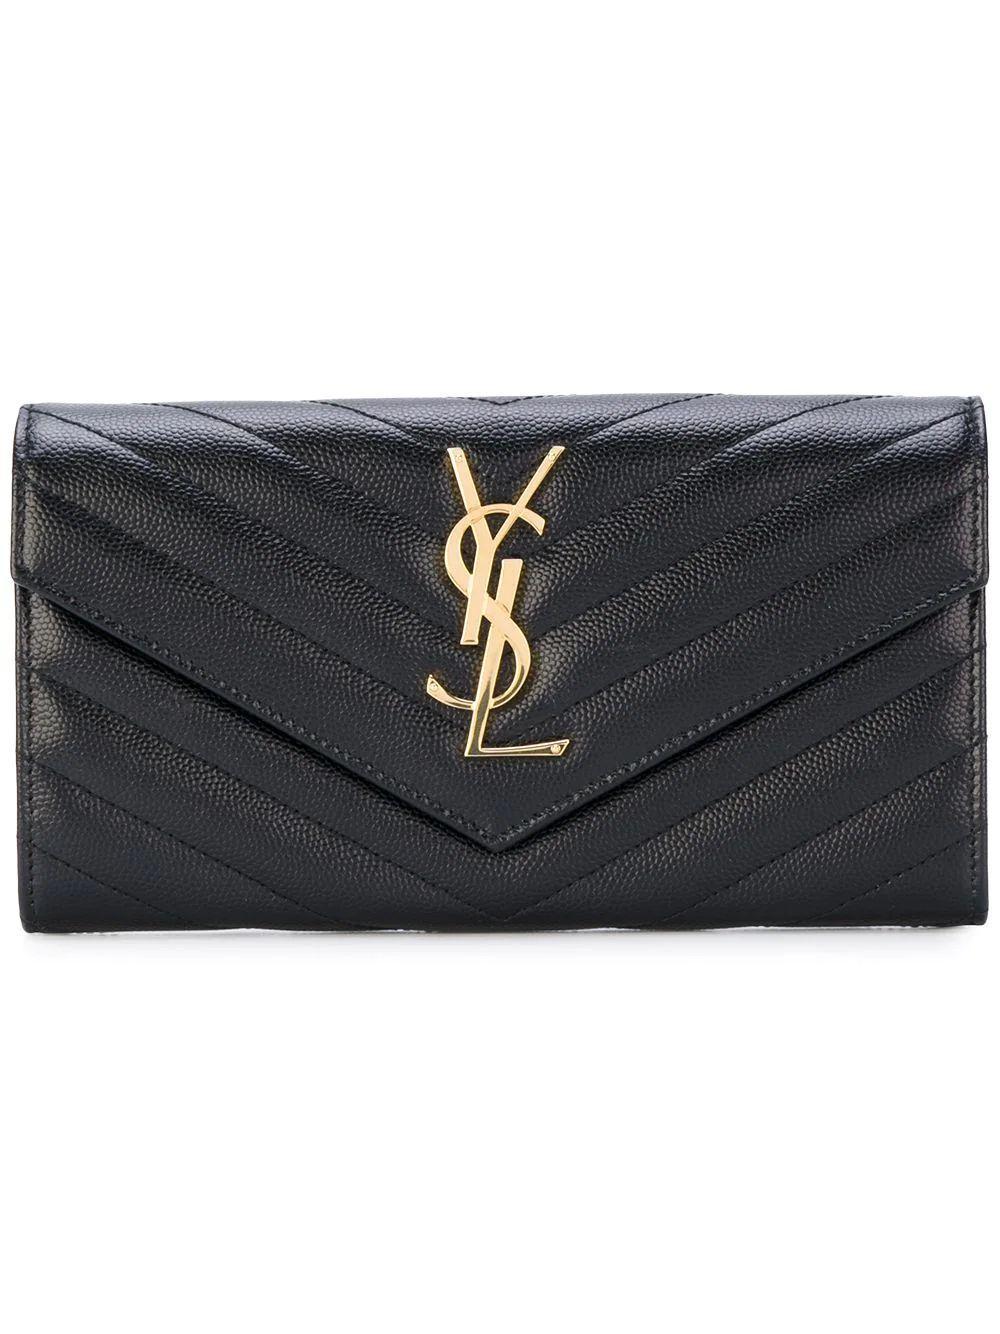 Monogram Flap Wallet Item # 372264BOW01-F21